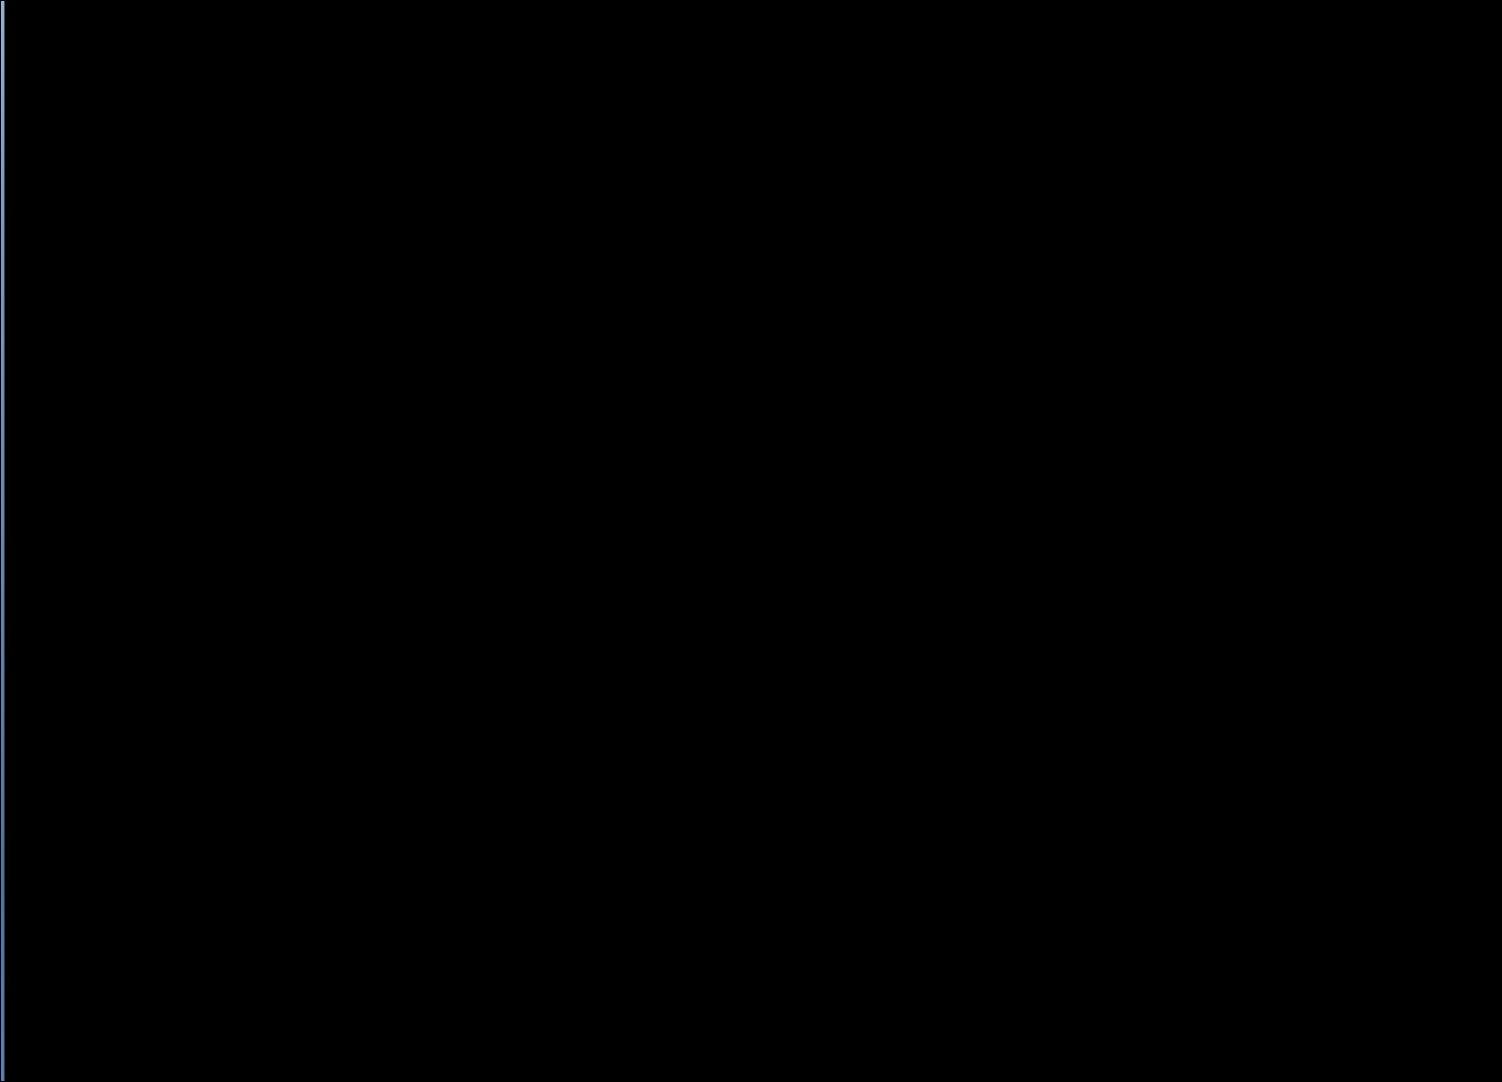 maxresdefault-1